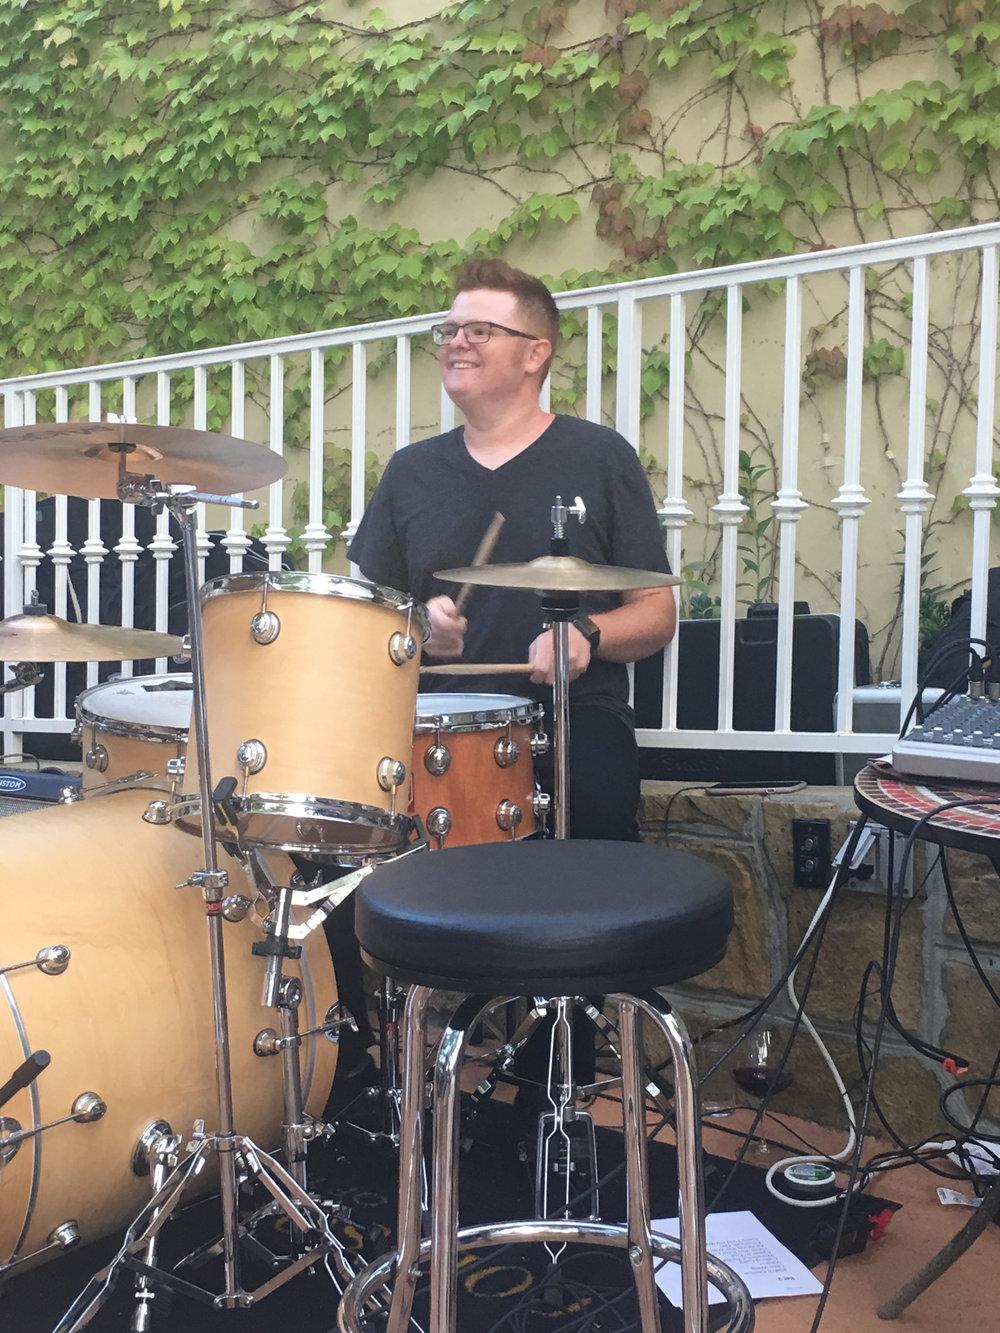 Colton, Drummer